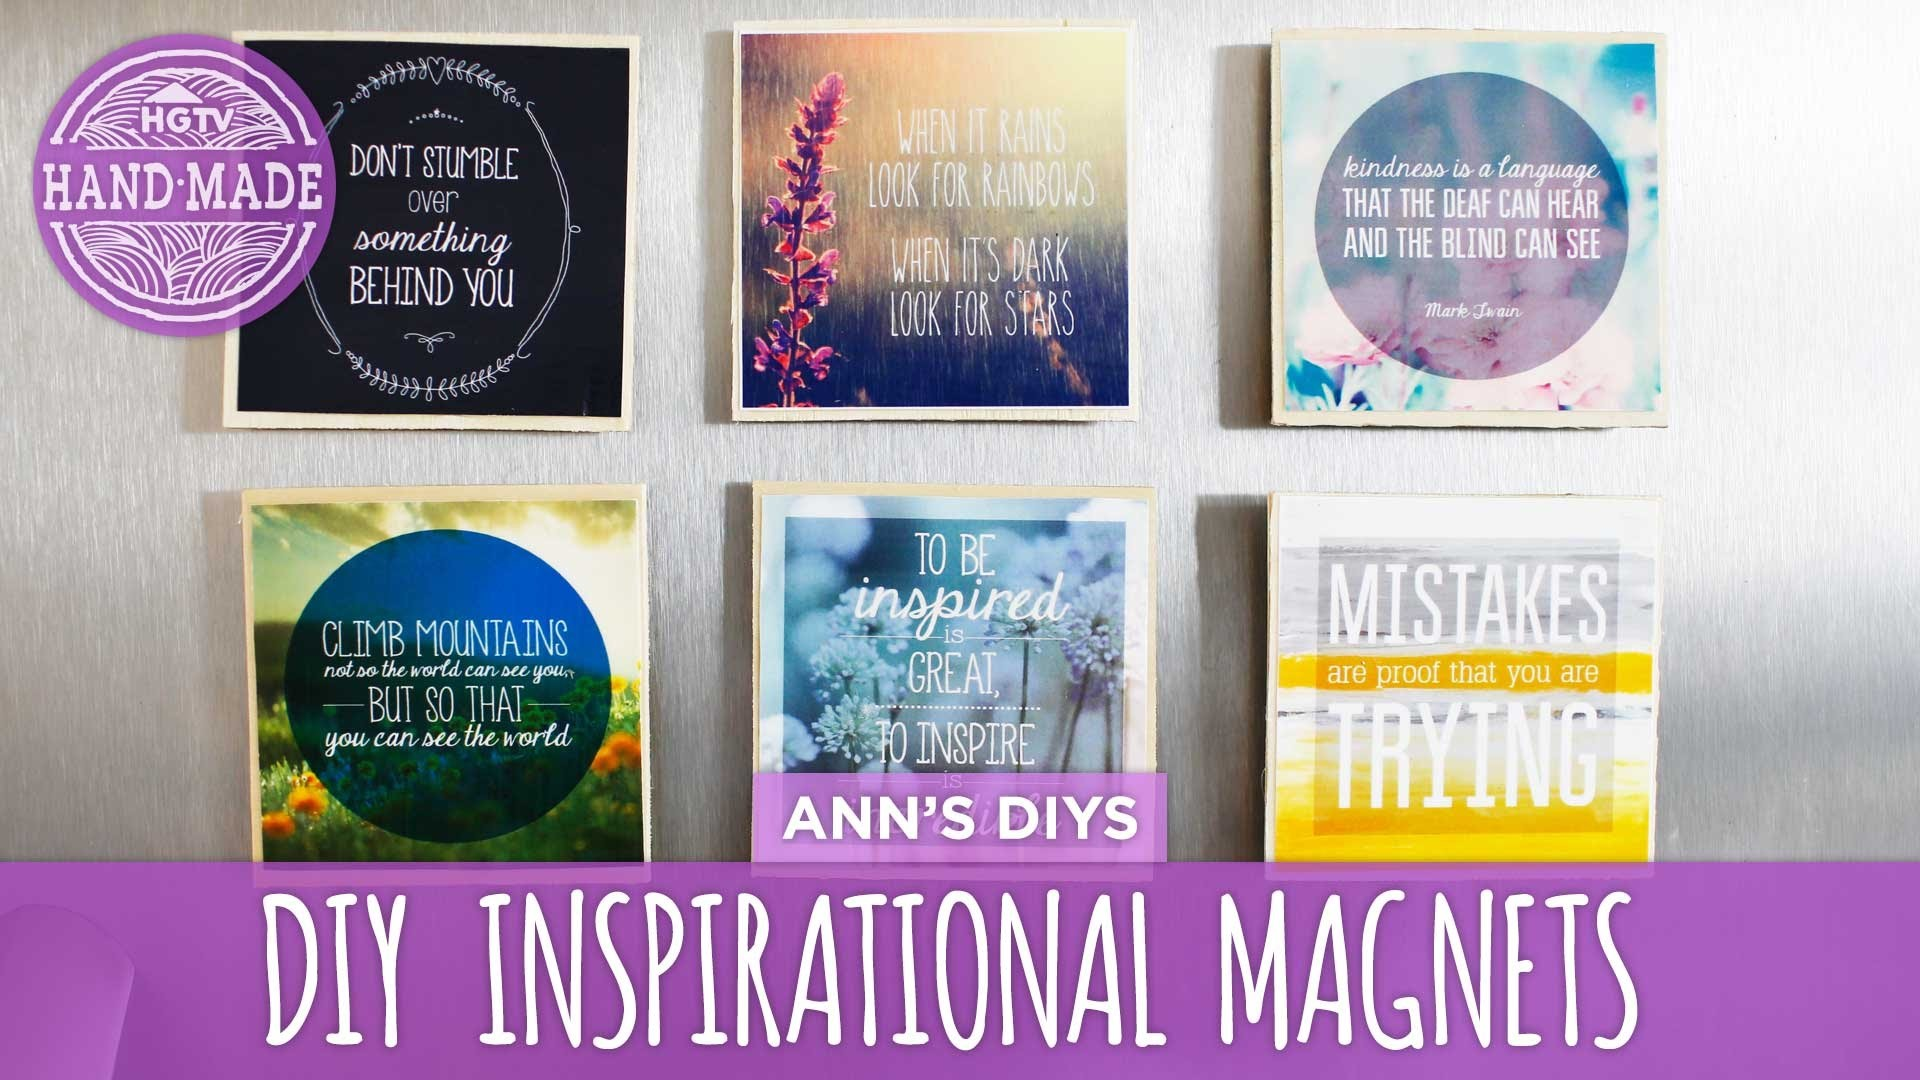 DIY Inspirational Magnets - HGTV Handmade